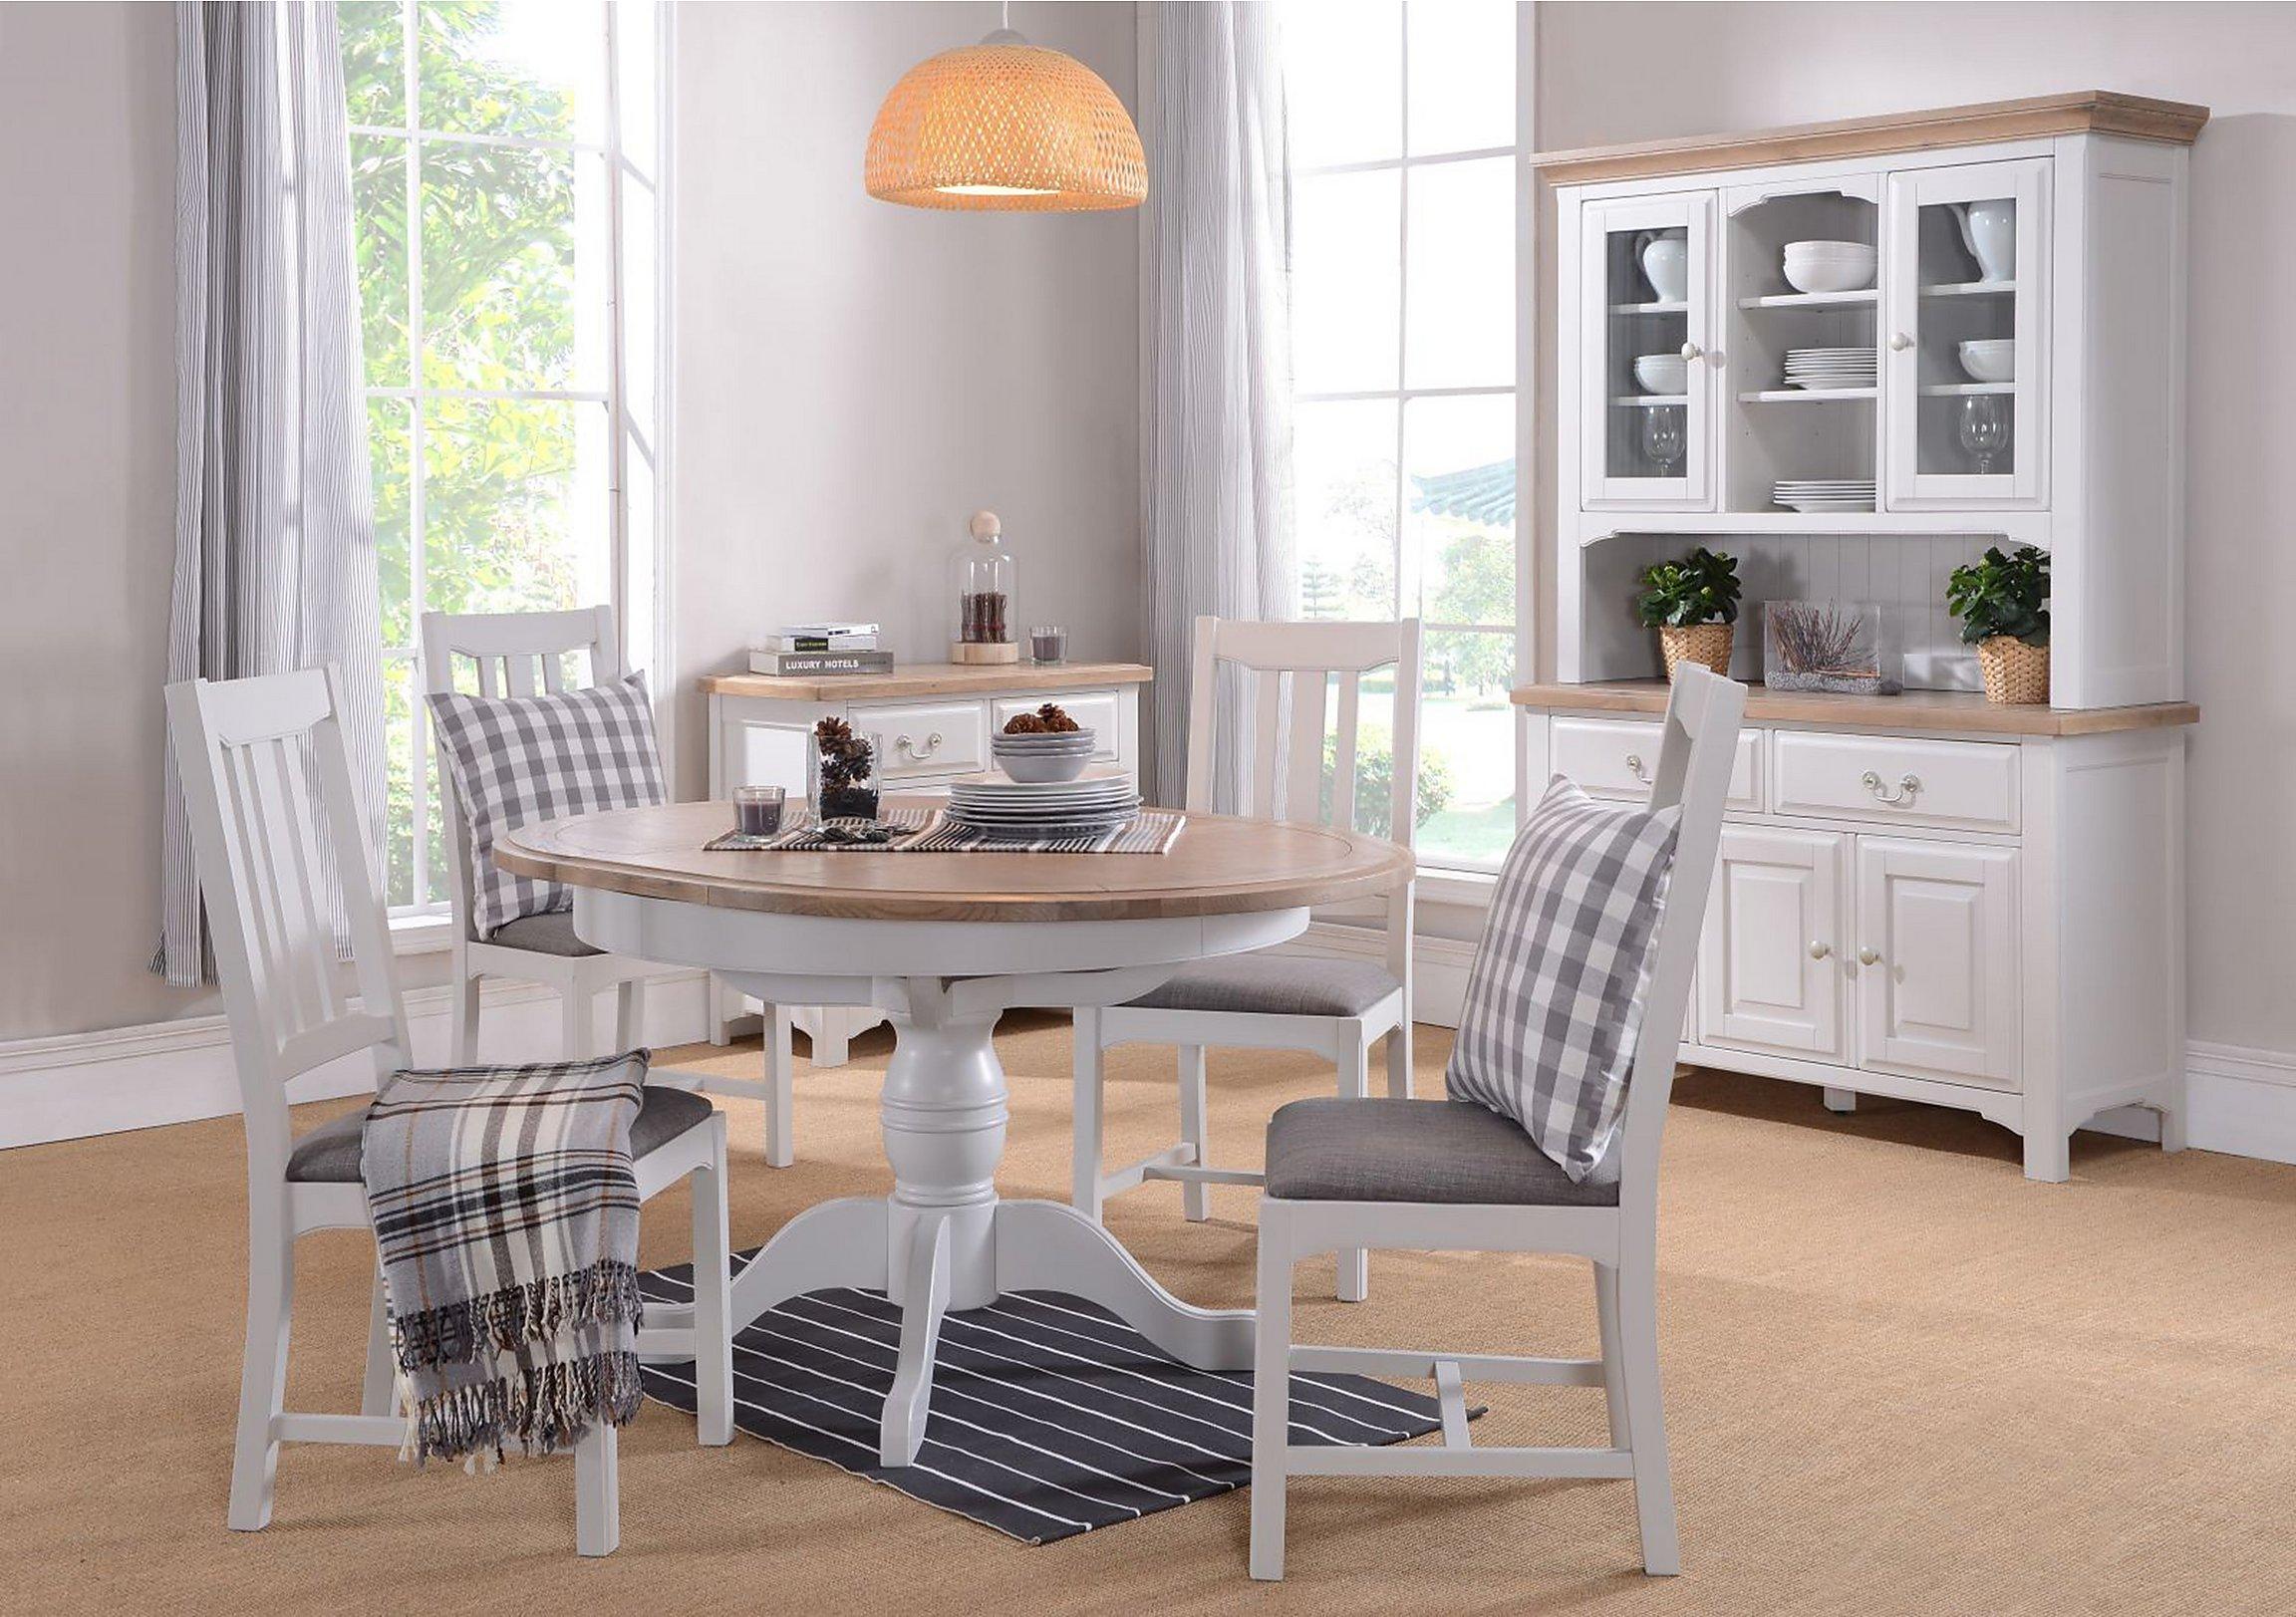 Furnitureland Cobham Round Table And 4 Chairs